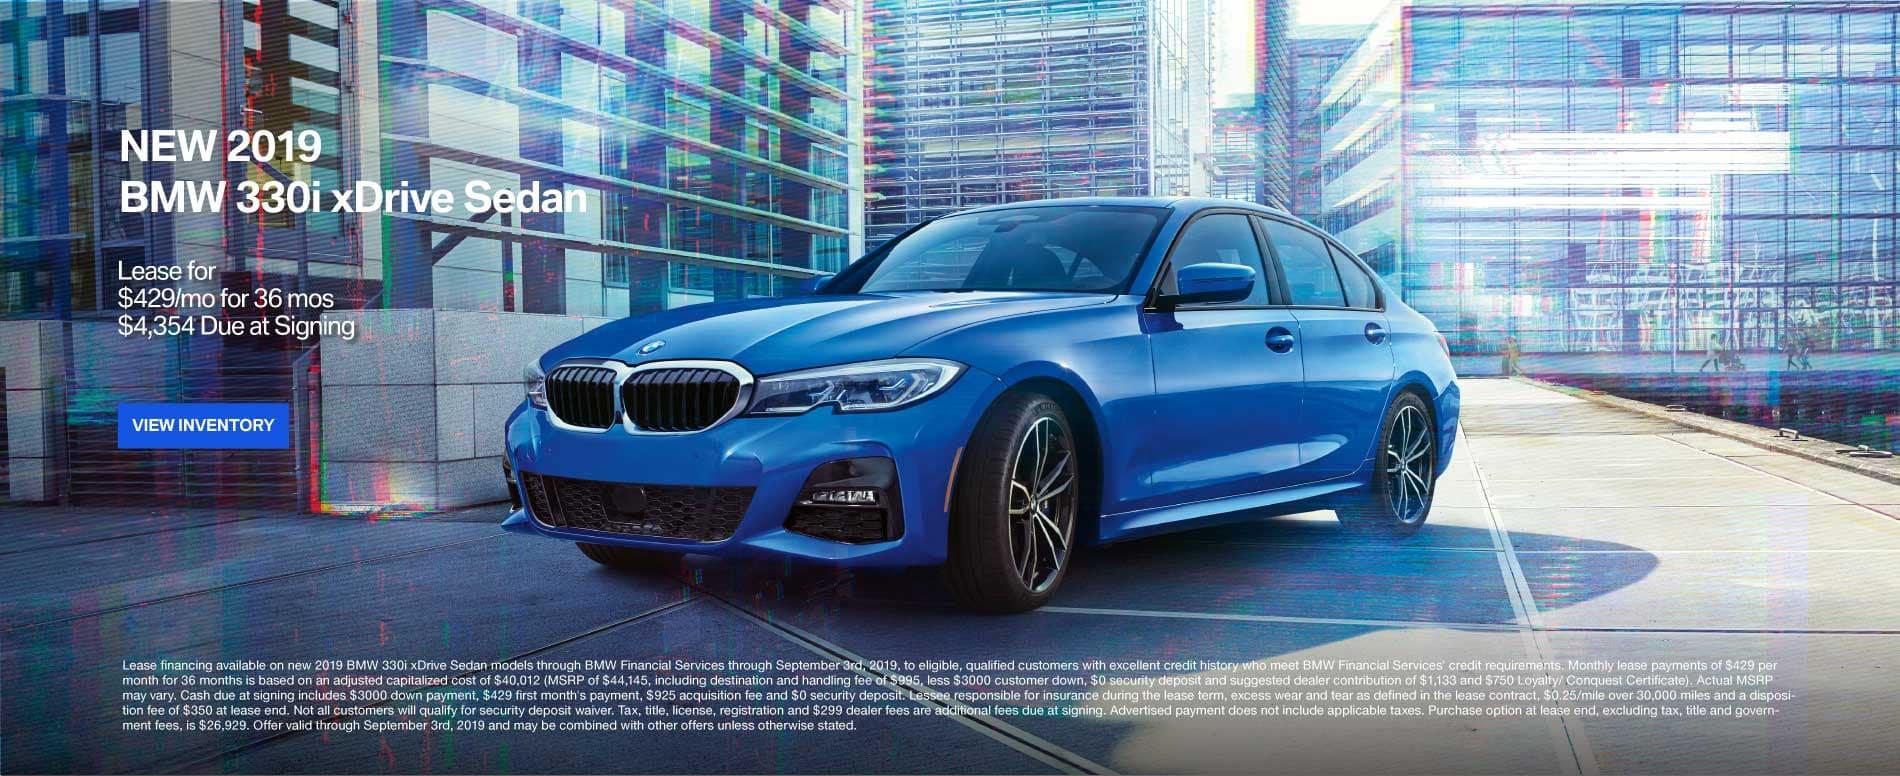 New 2019 BMW 330i